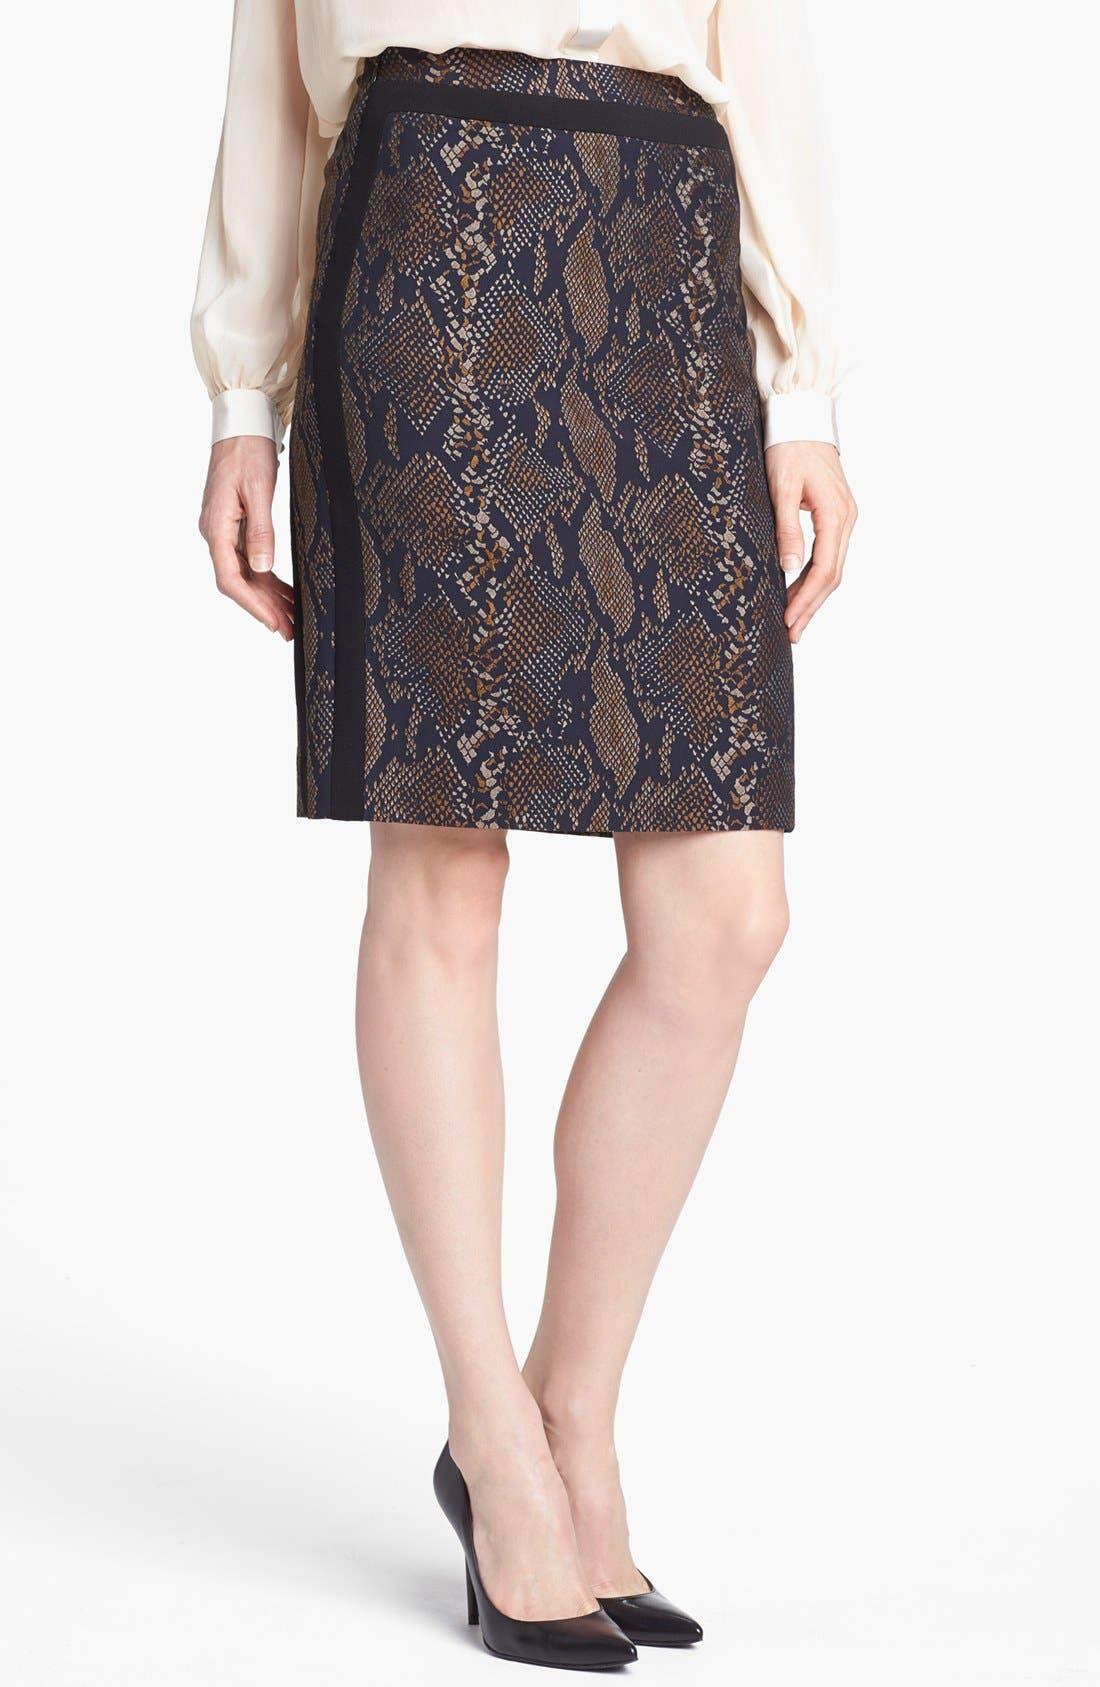 Alternate Image 1 Selected - Diane von Furstenberg 'Marta' Pencil Skirt